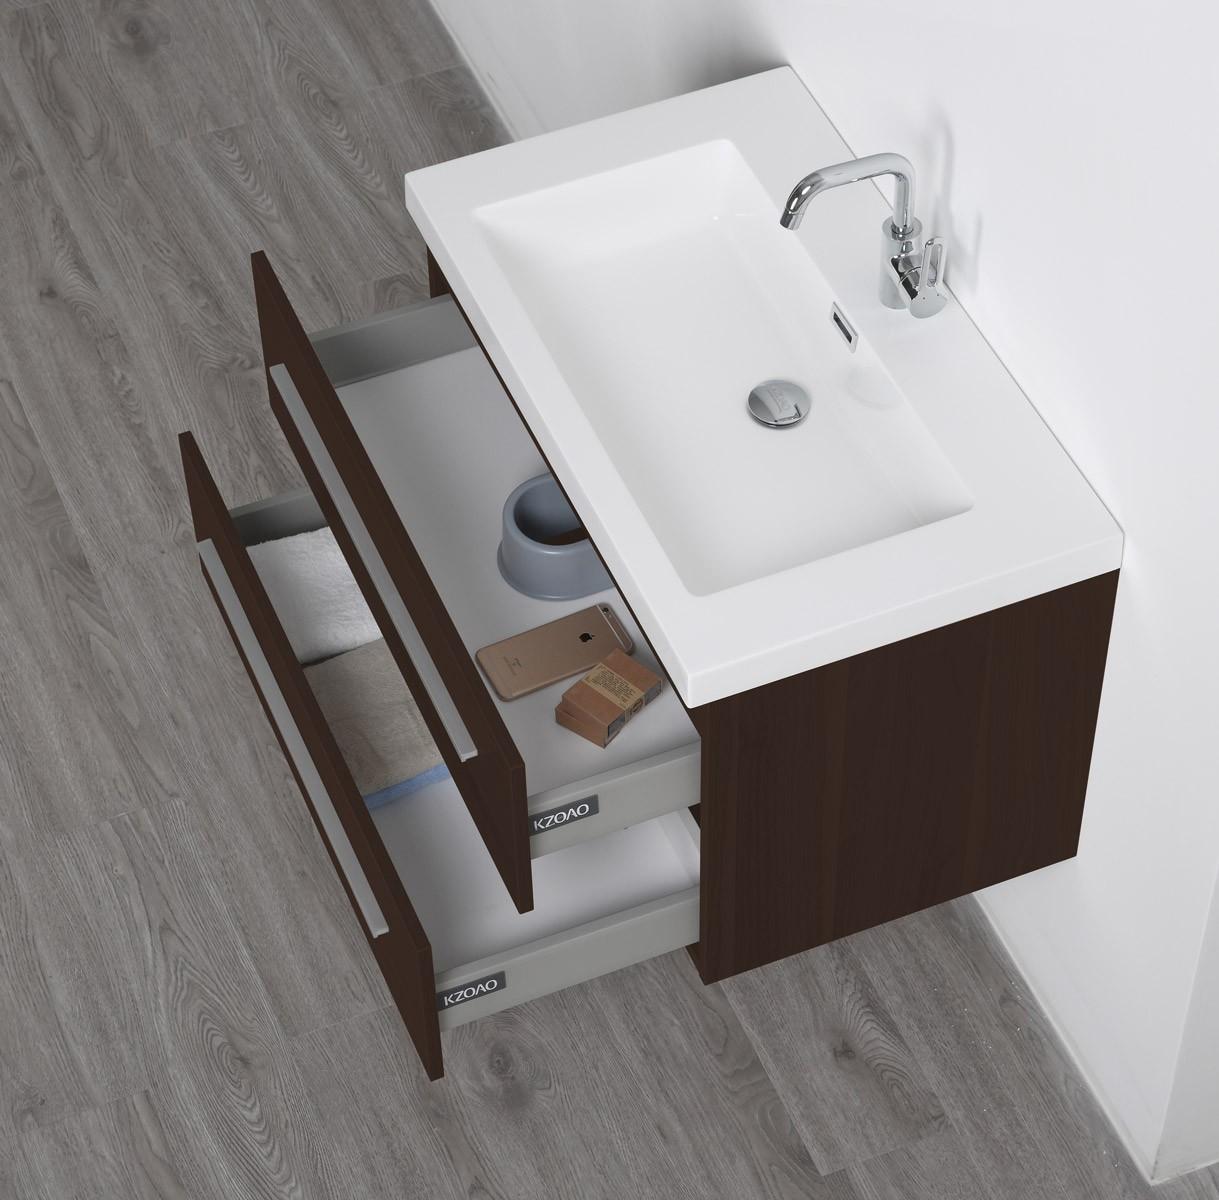 madrid waschtisch set 100 cm mokka badewelt badezimmer m bel. Black Bedroom Furniture Sets. Home Design Ideas